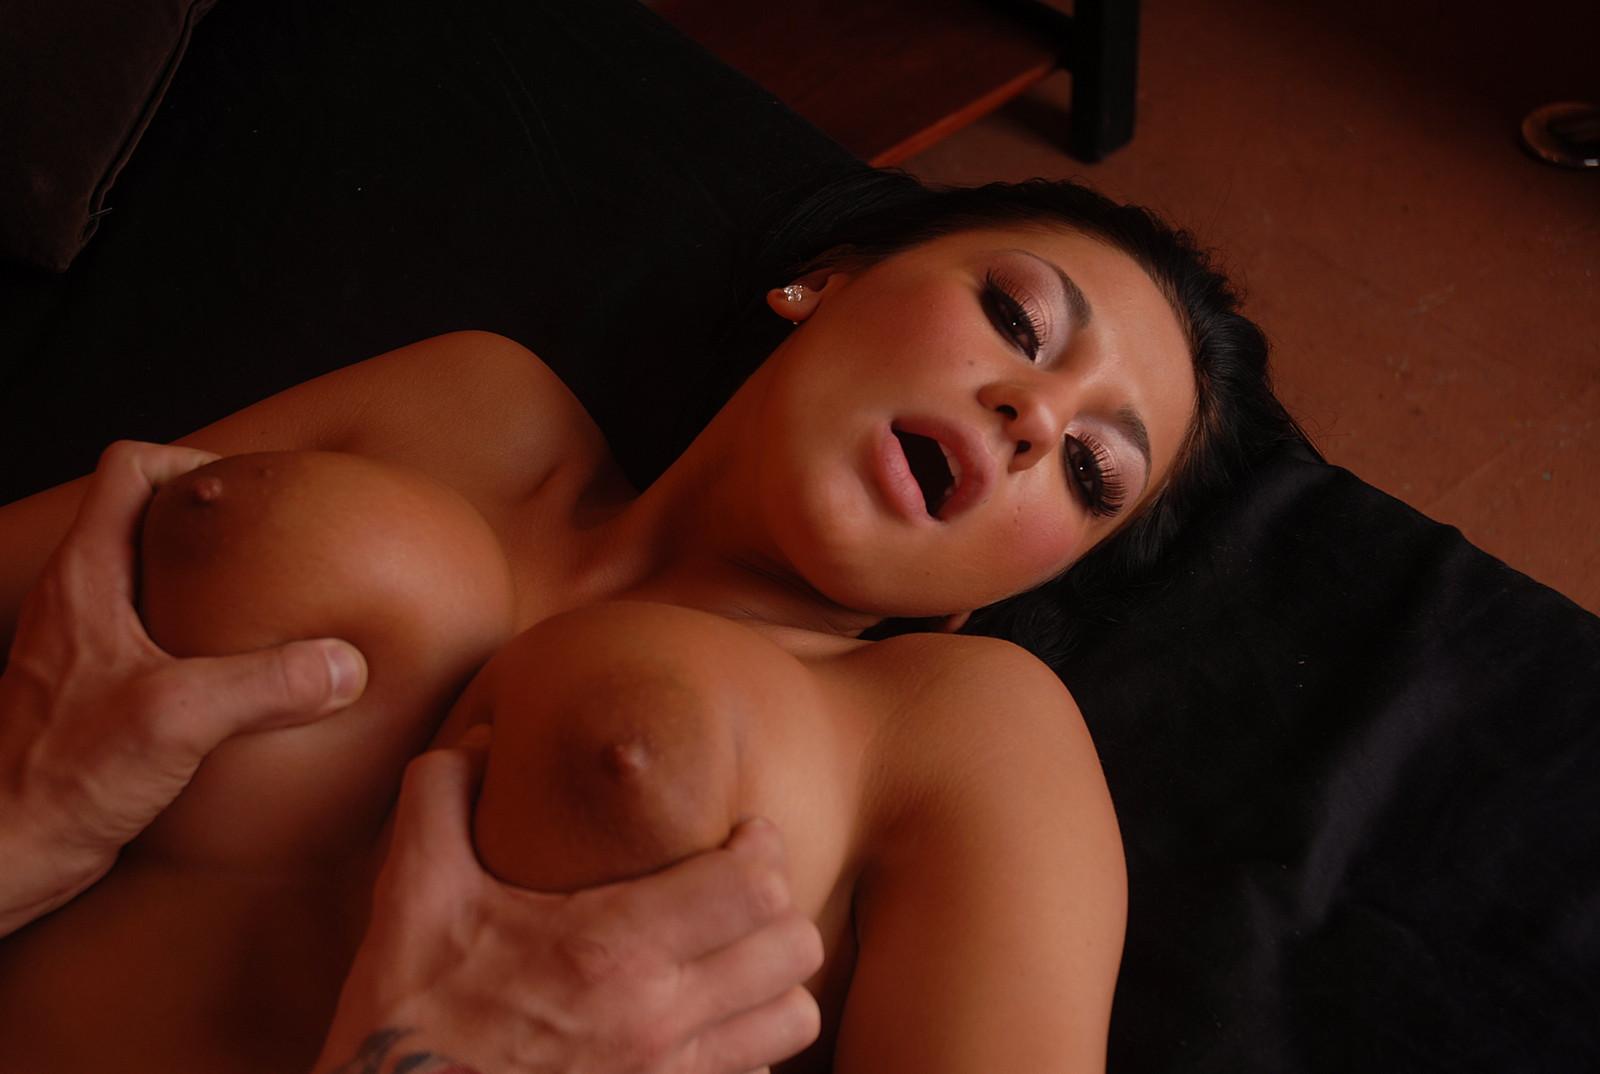 free sex hi sex fuking porn